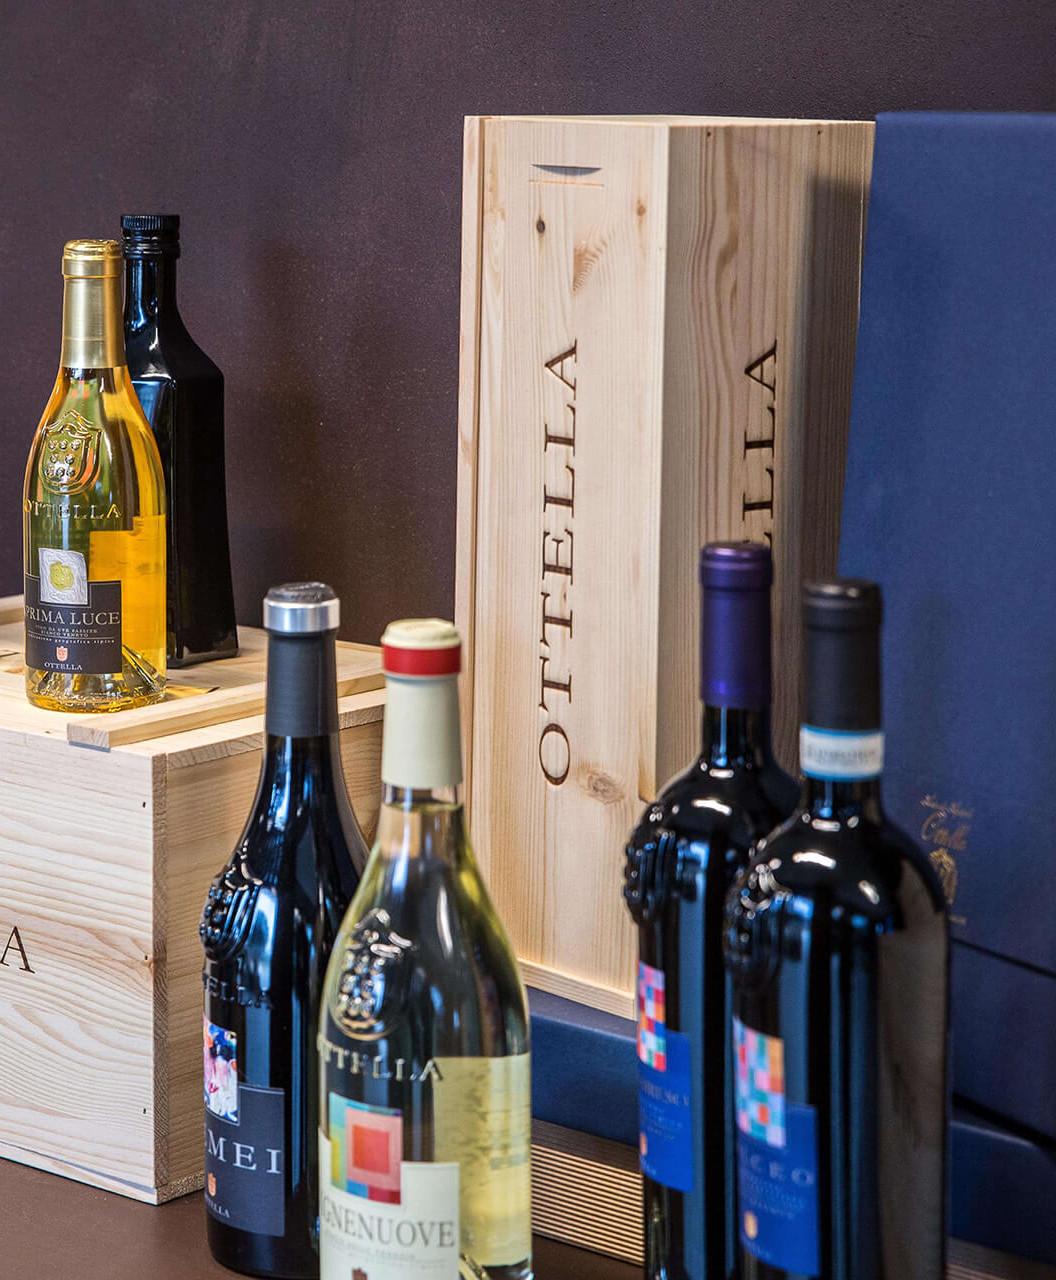 Vini del Lugana - Cantina vinicola Ottella